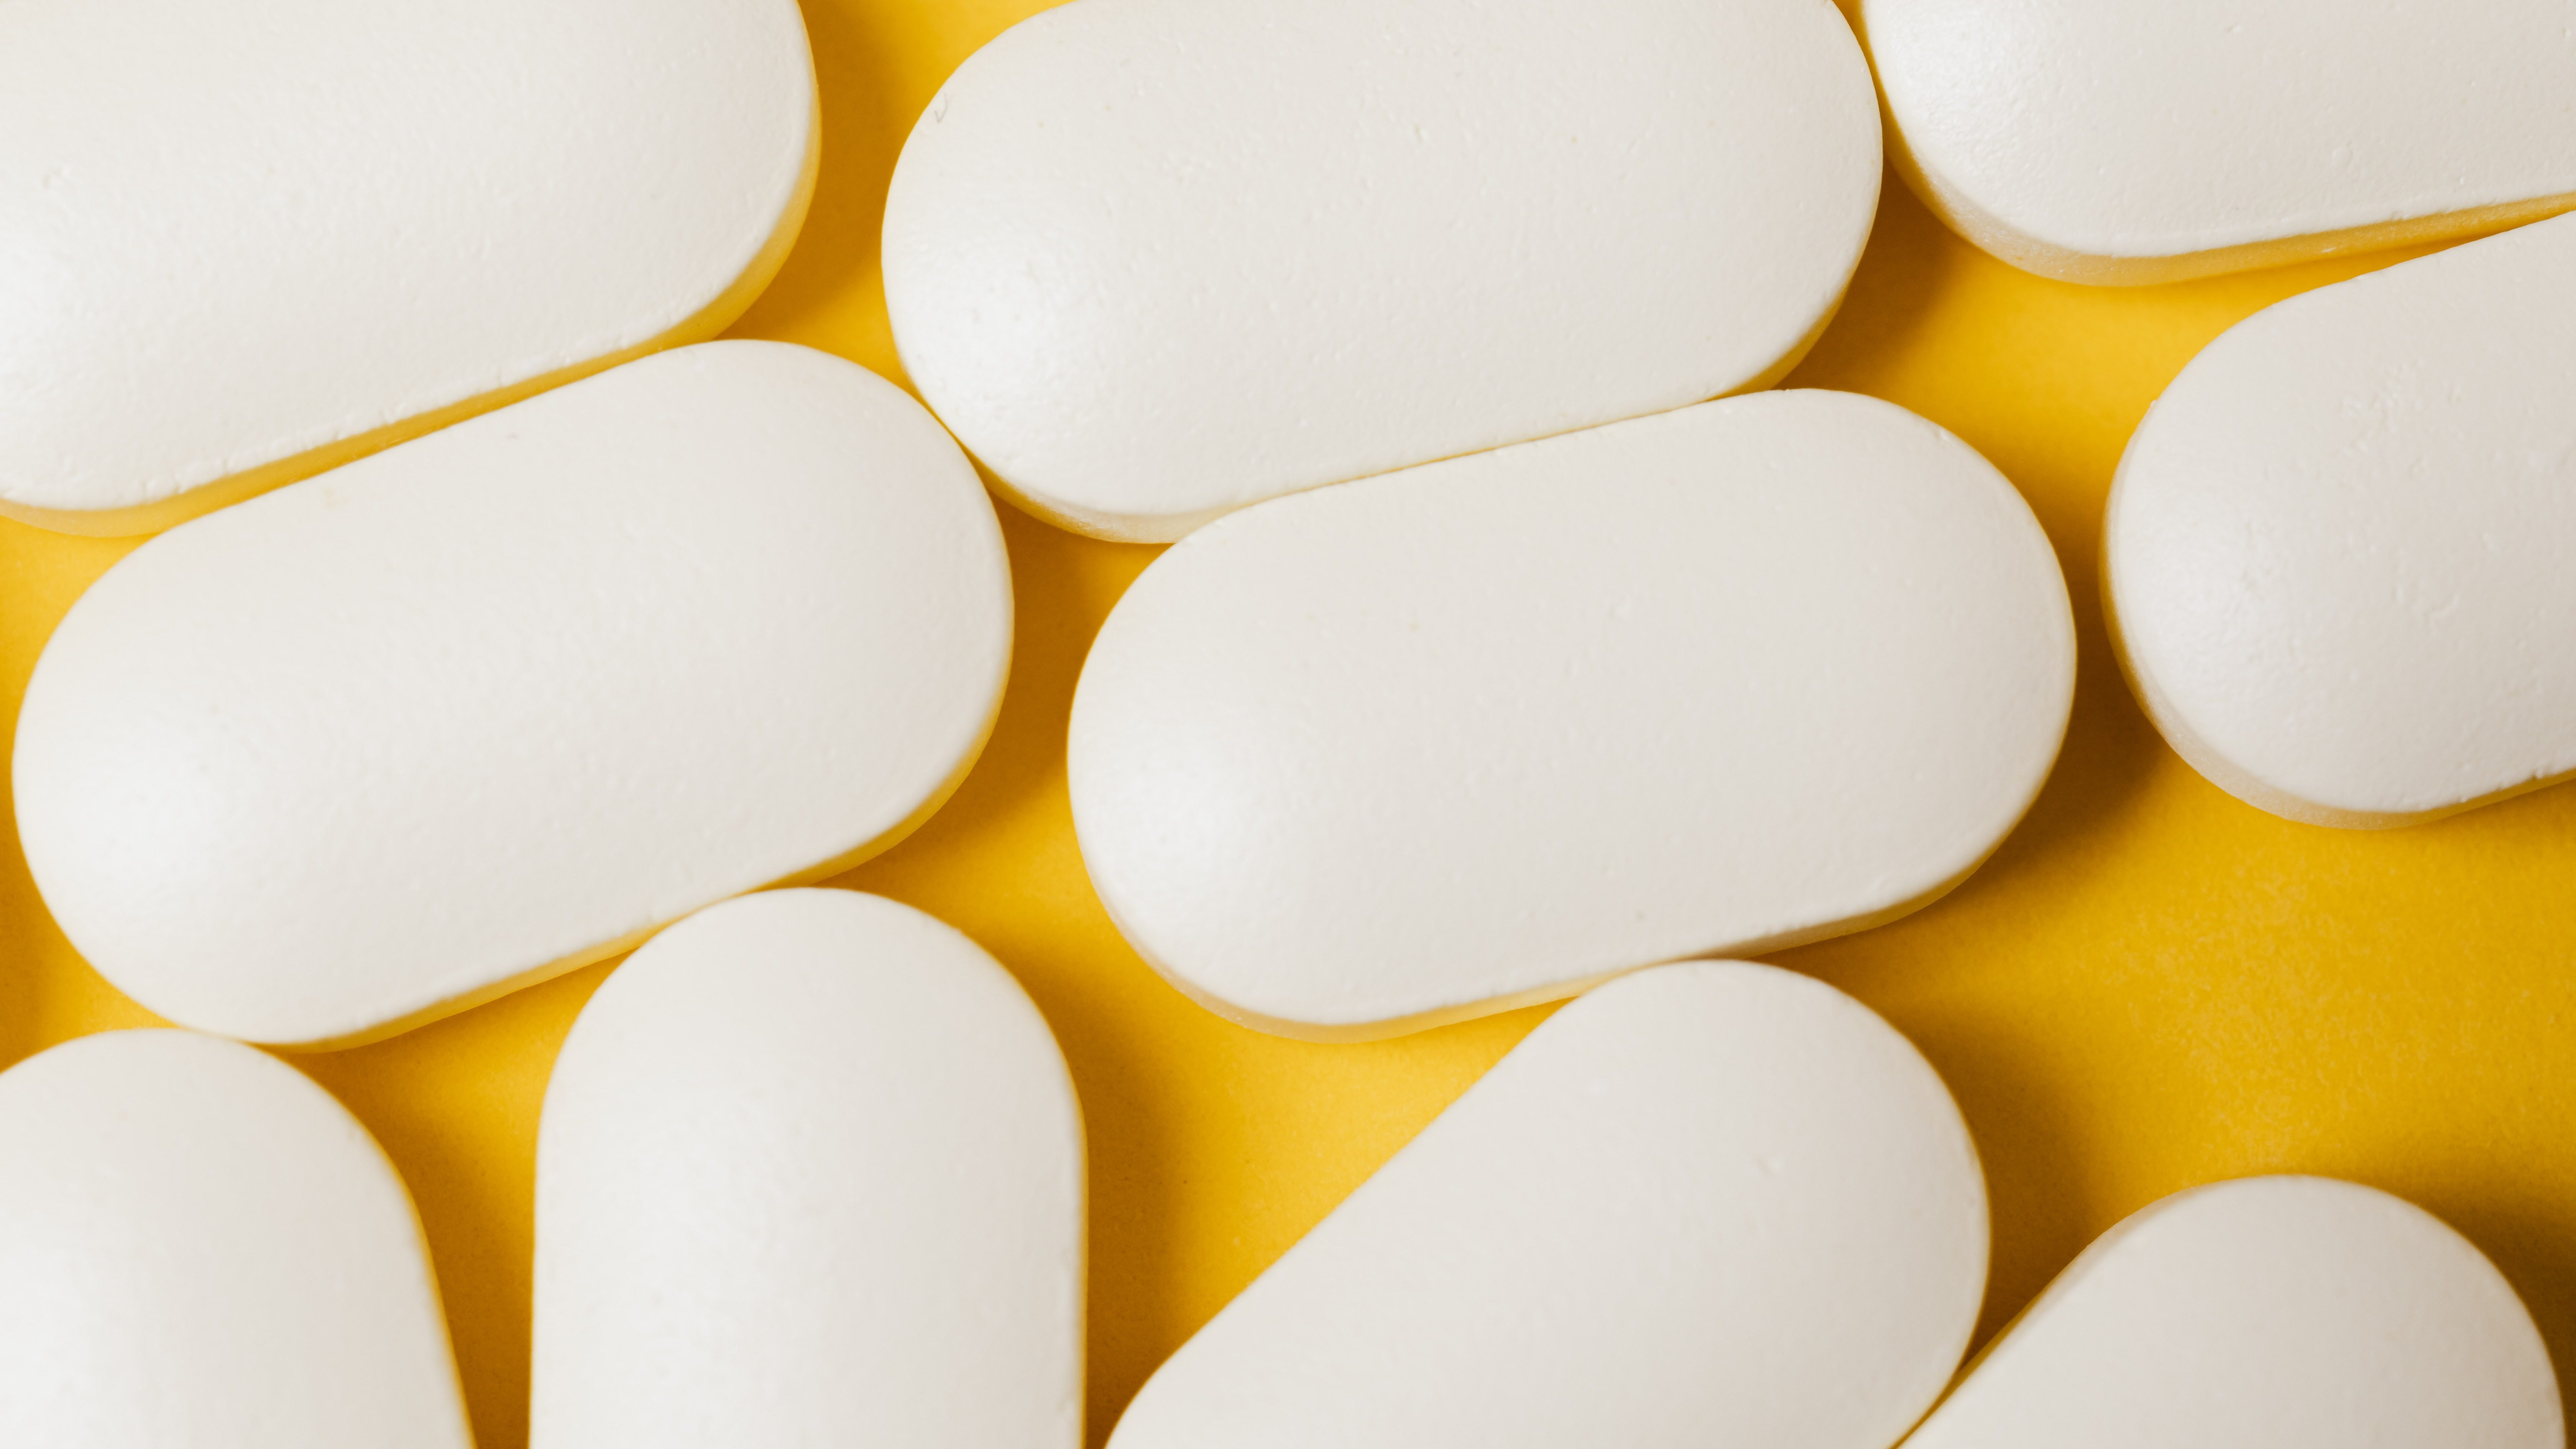 Pastillas de ibuprofeno.